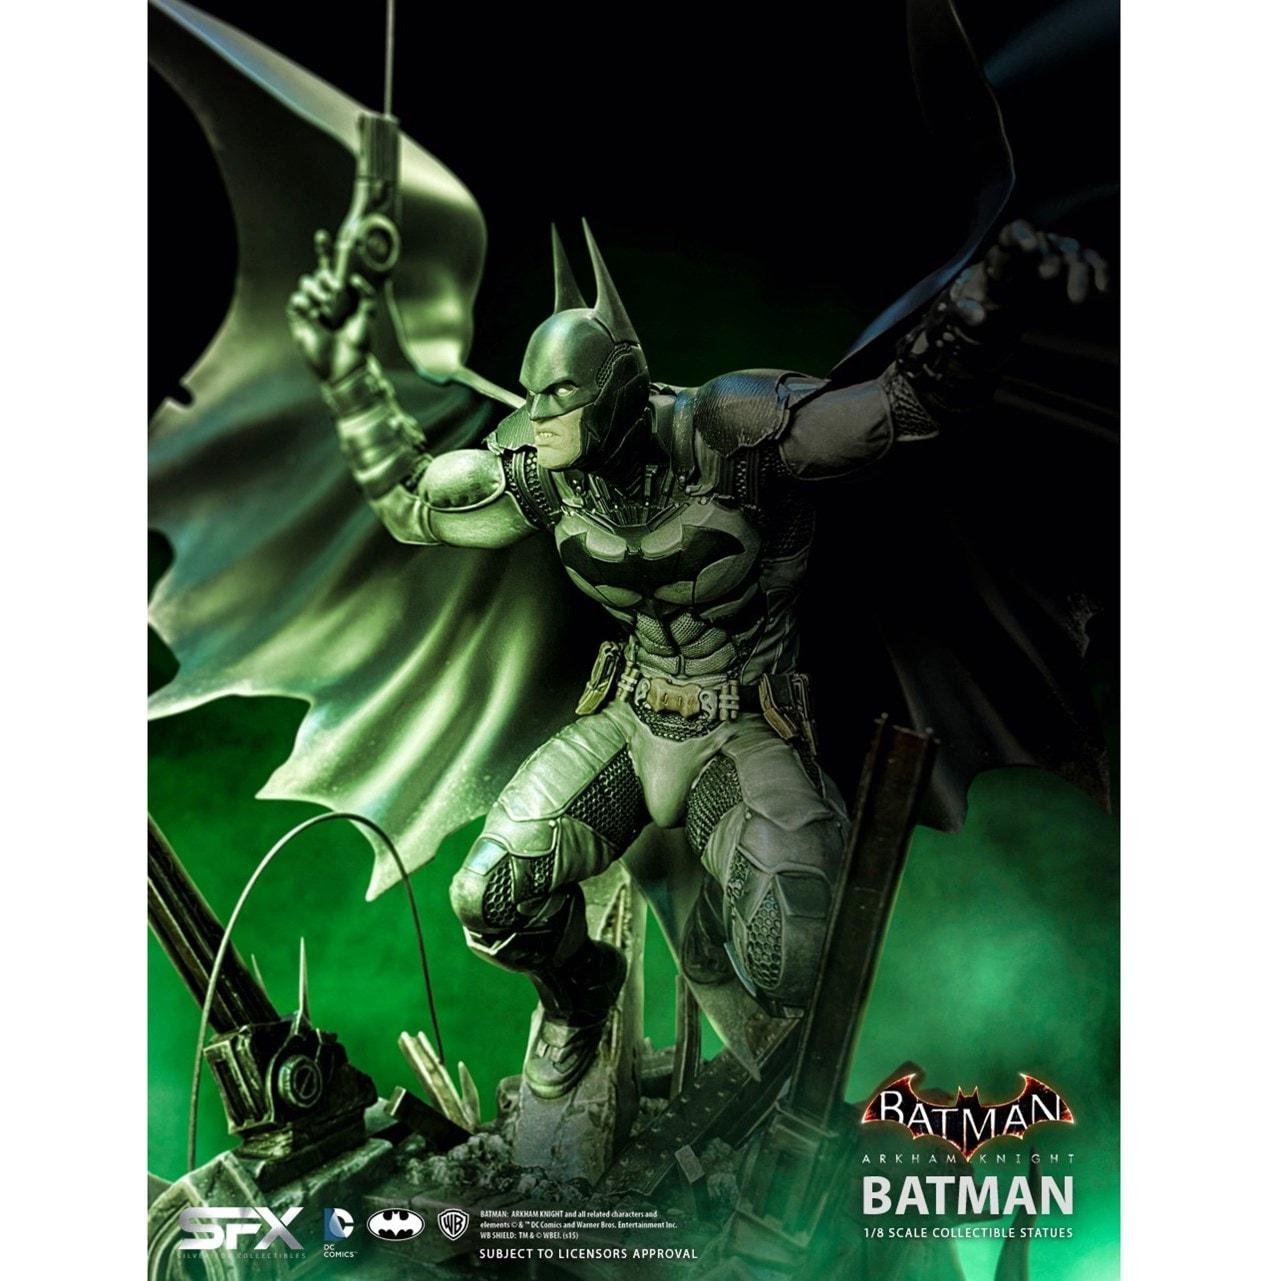 Batman: Arkham Knight Collectible Statue - 2